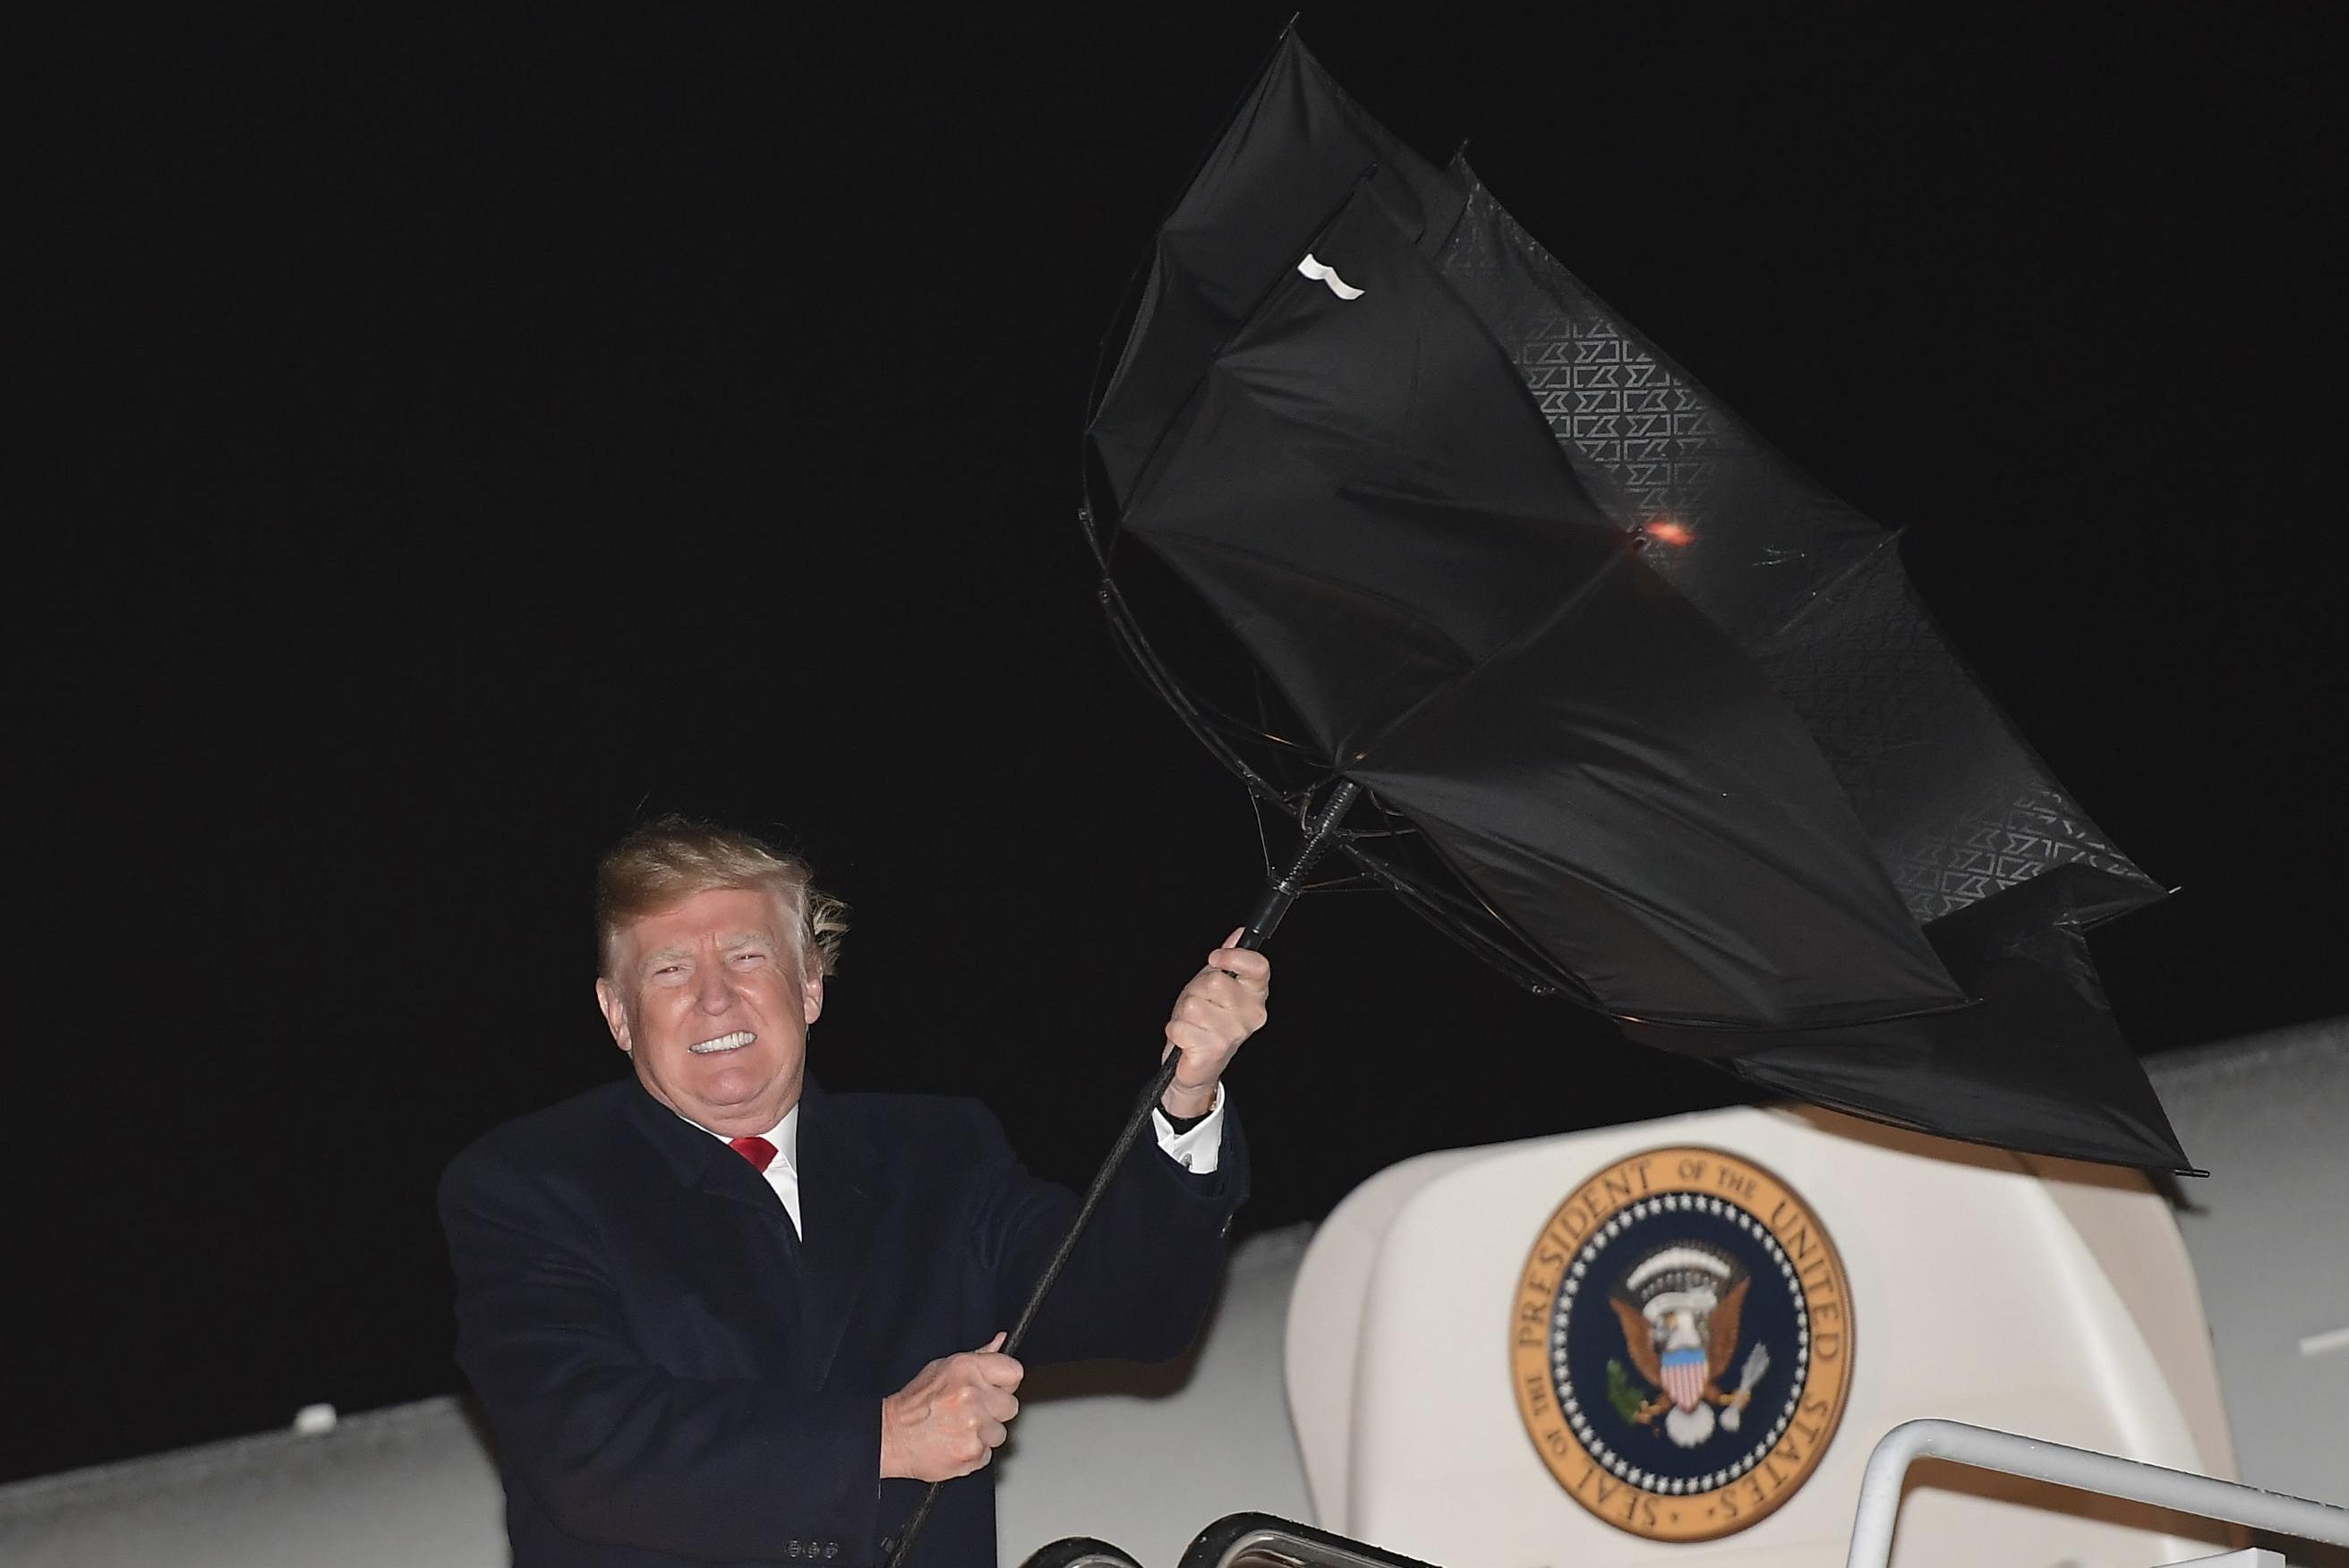 Donald Trump struggling with a broken umbrella.